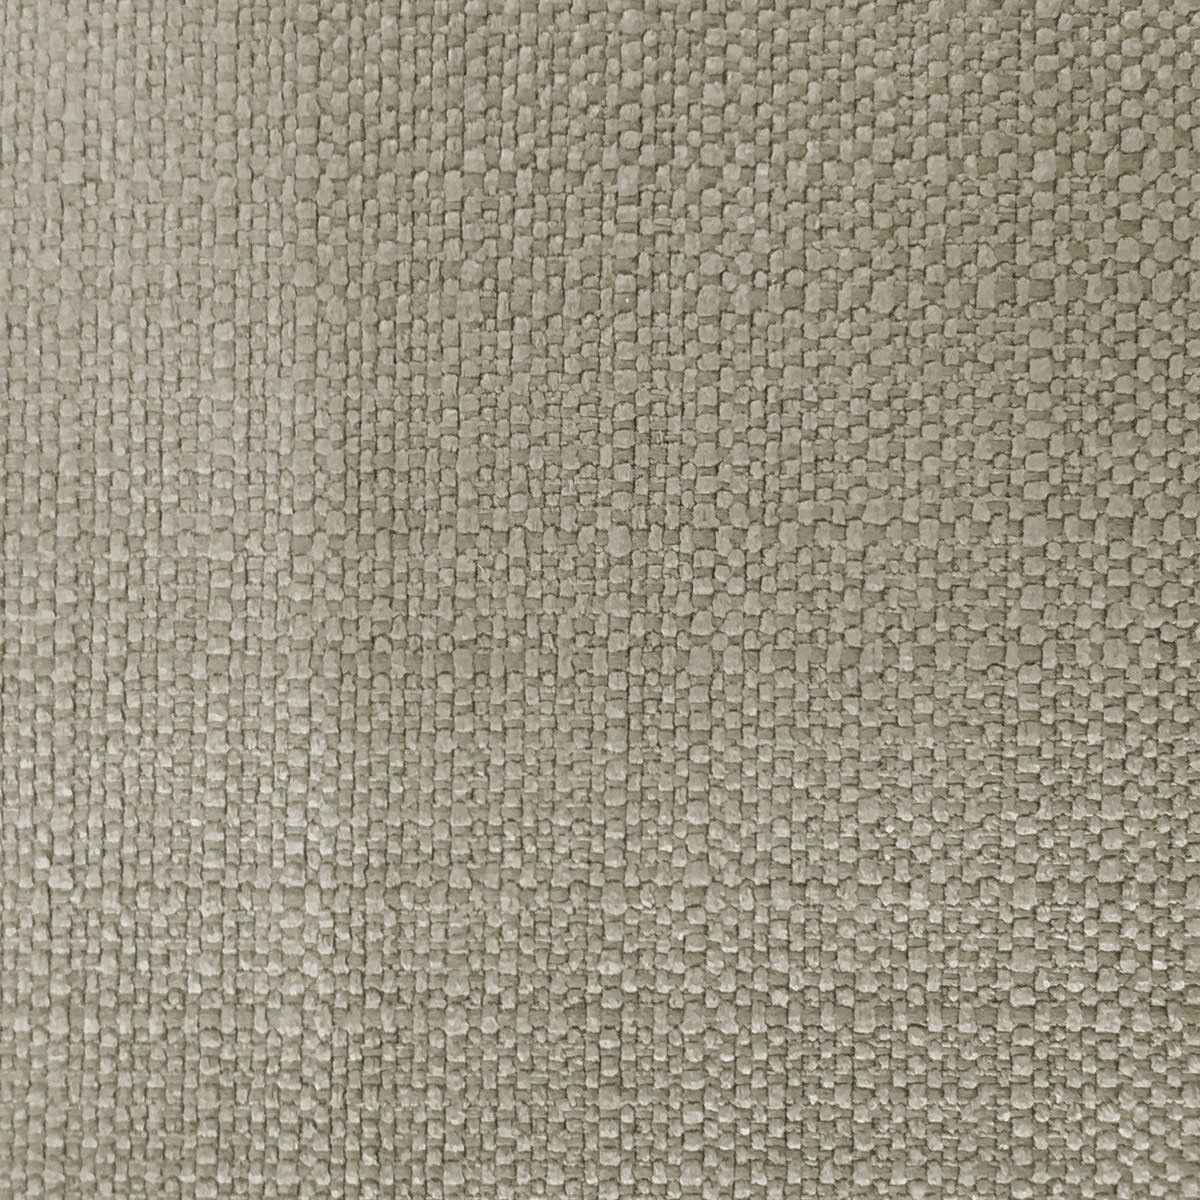 - Sachi Dolphin Linen-Like Texture Futon Cover Queen